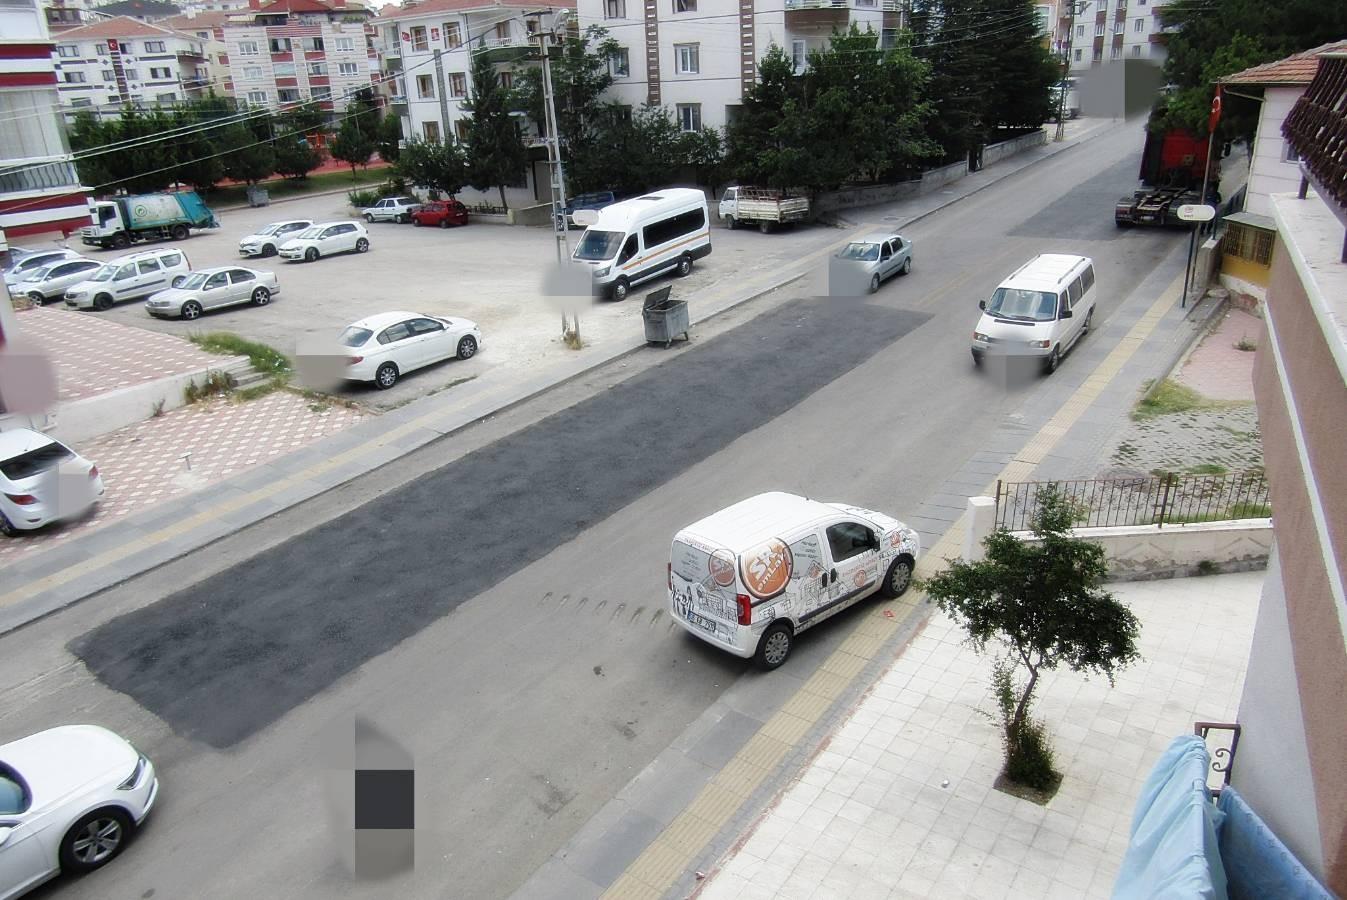 SR EMLAK'TAN PİYADE MAH'DE 3+1 115m² ARA KATTA ÖN CEPHE DAİRE